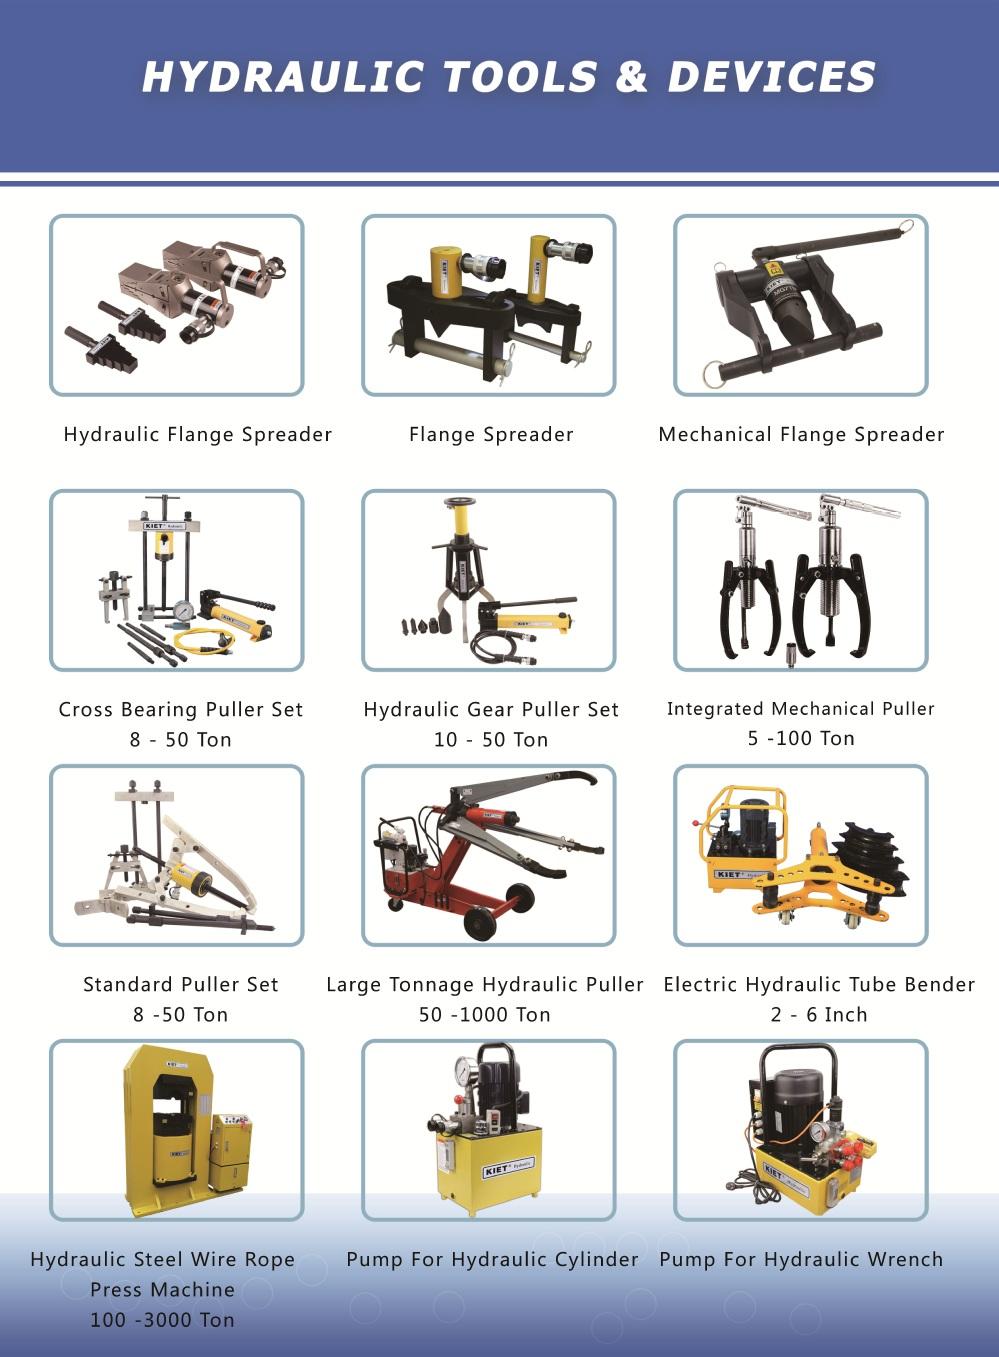 rsm series ton enerpac hydraulic flat jack hydraulic jack rsm series 30 ton enerpac hydraulic flat jack hydraulic jack manufacturer